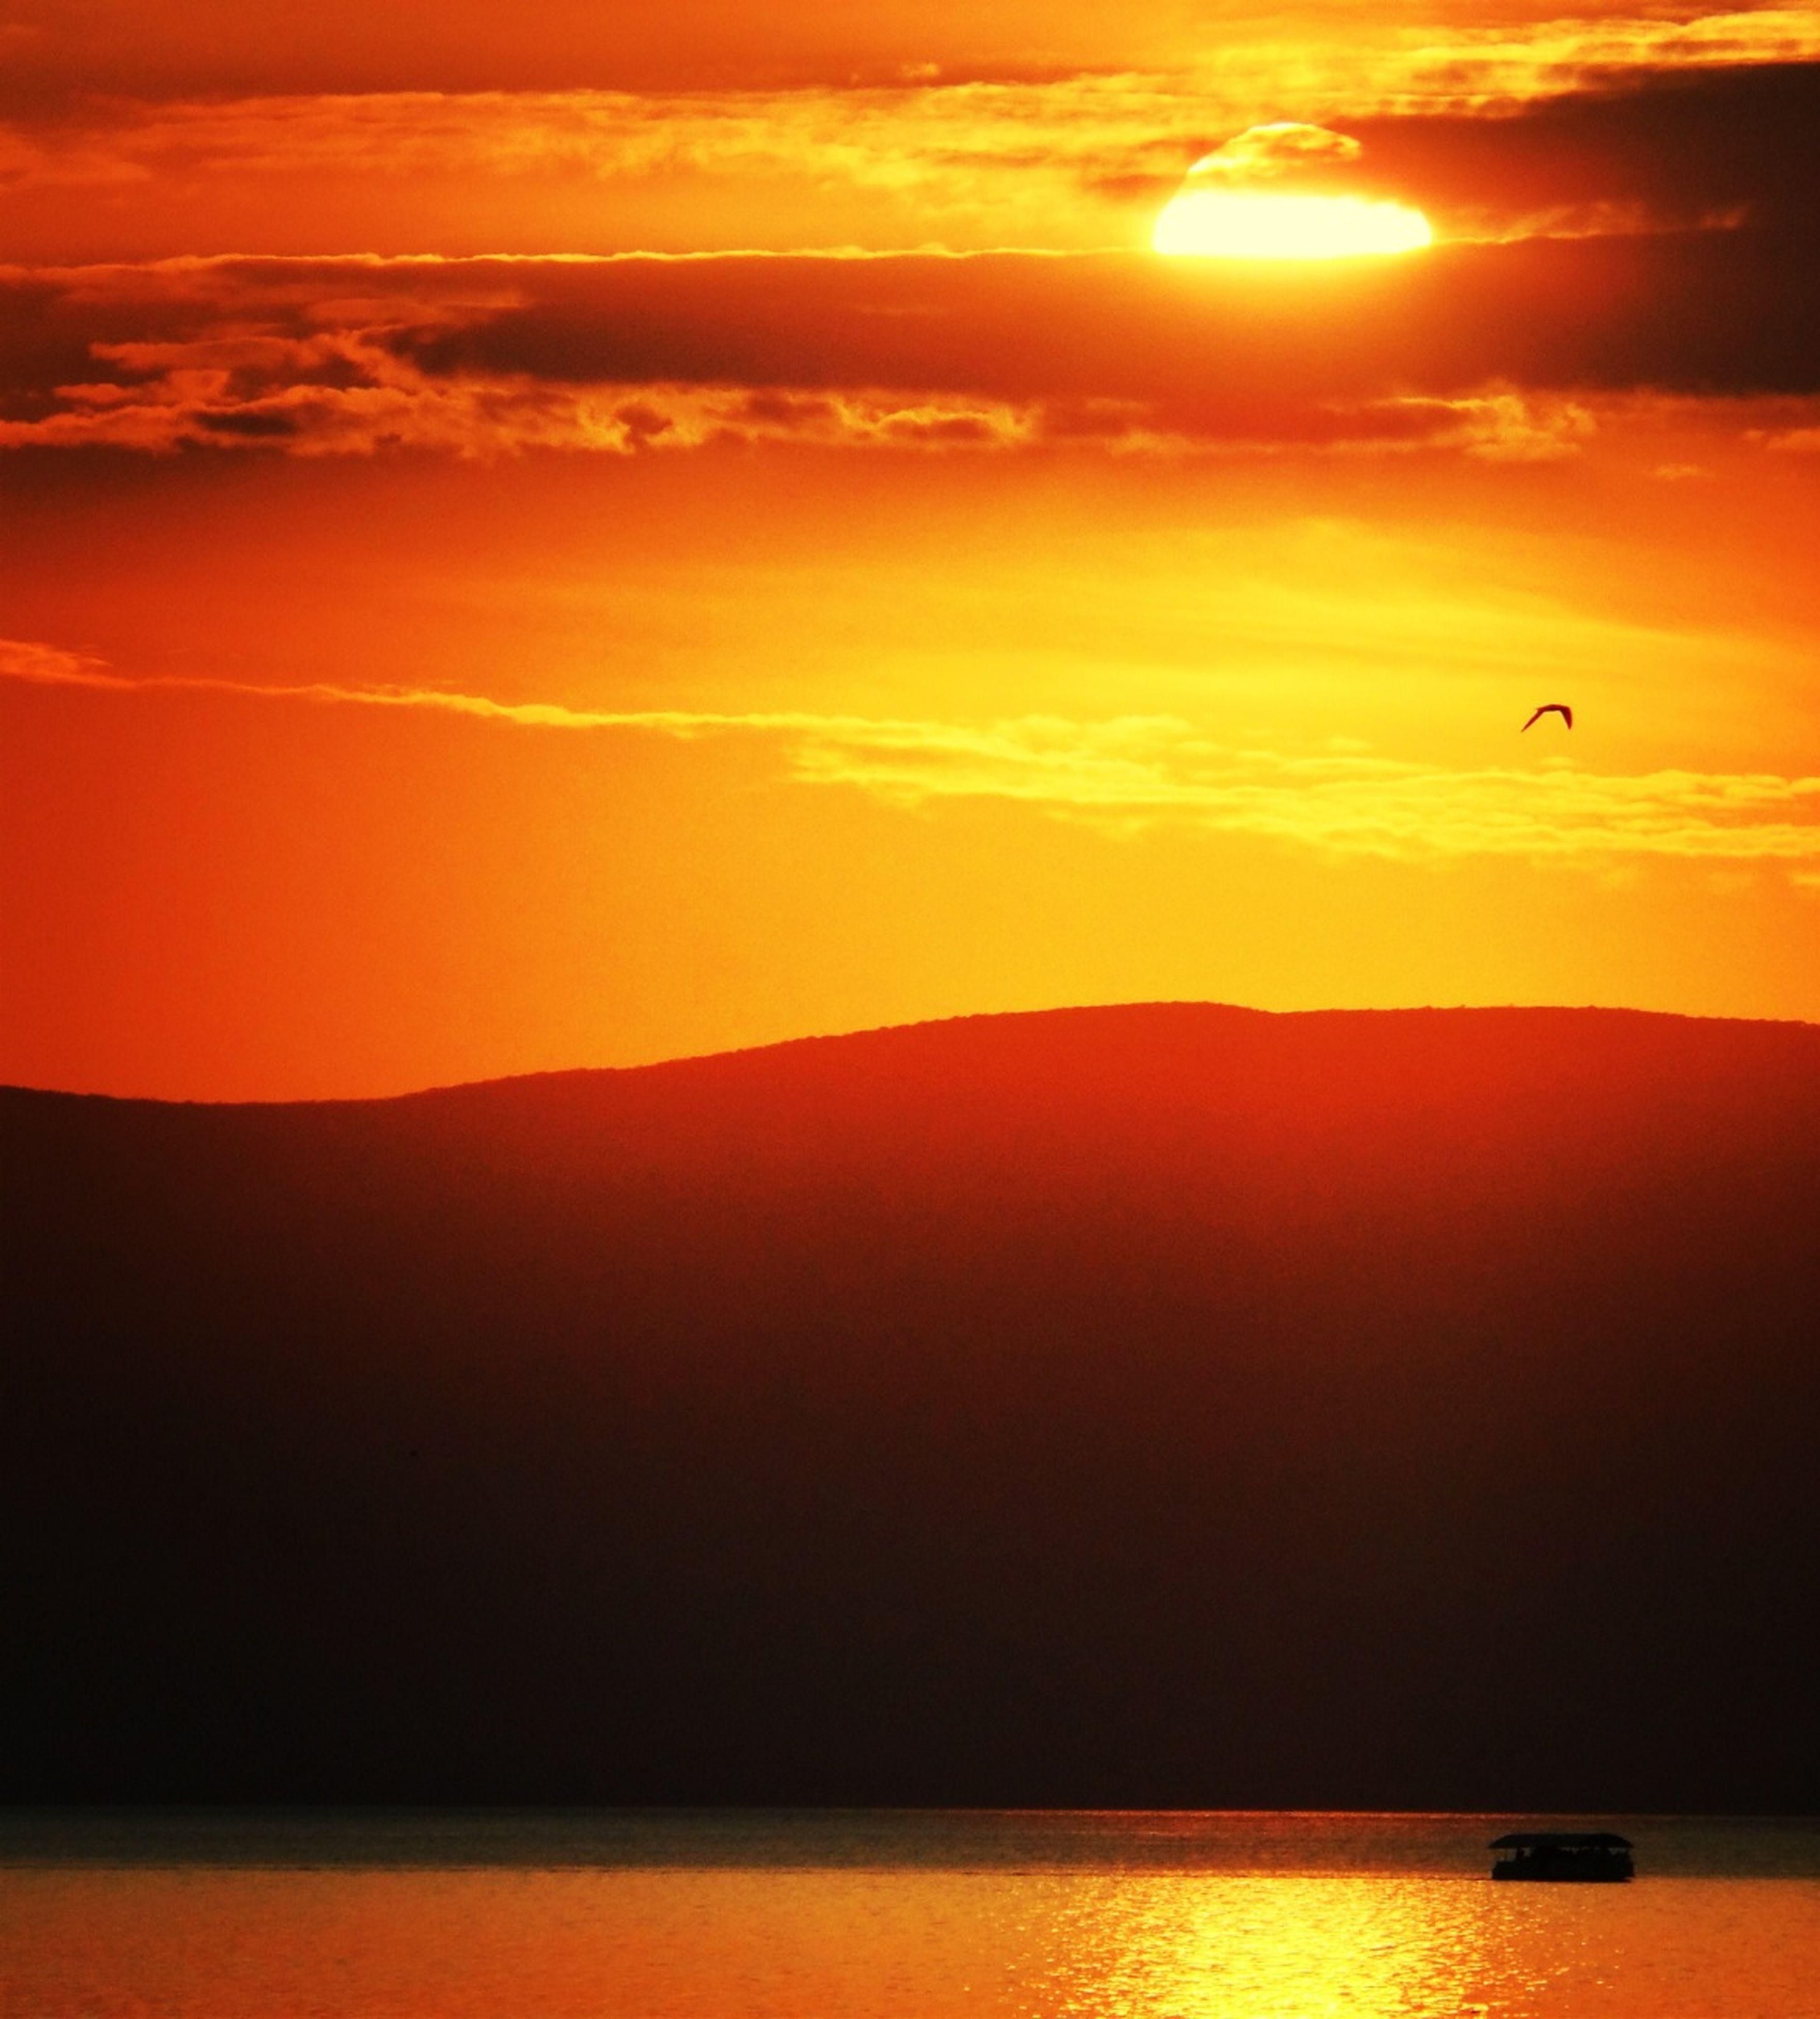 sunset, orange color, scenics, tranquil scene, sun, tranquility, silhouette, beauty in nature, sky, idyllic, mountain, nature, landscape, mountain range, majestic, sunlight, non-urban scene, horizon over land, remote, outdoors